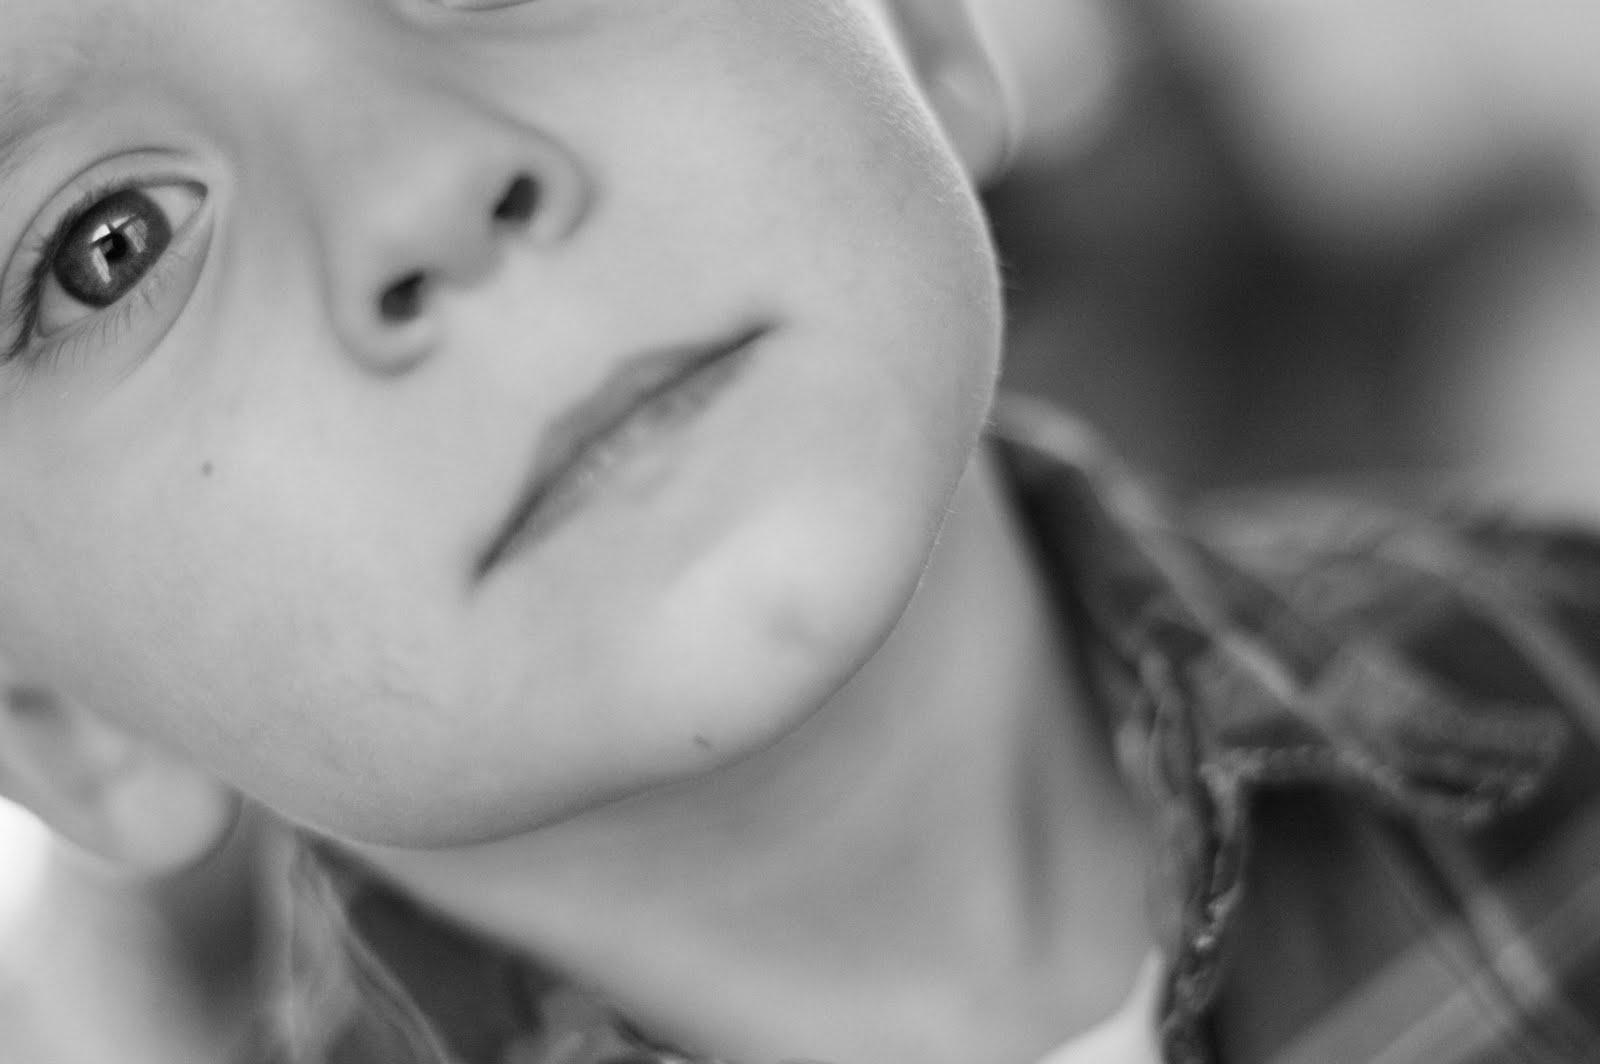 cleft chin baby - photo #11